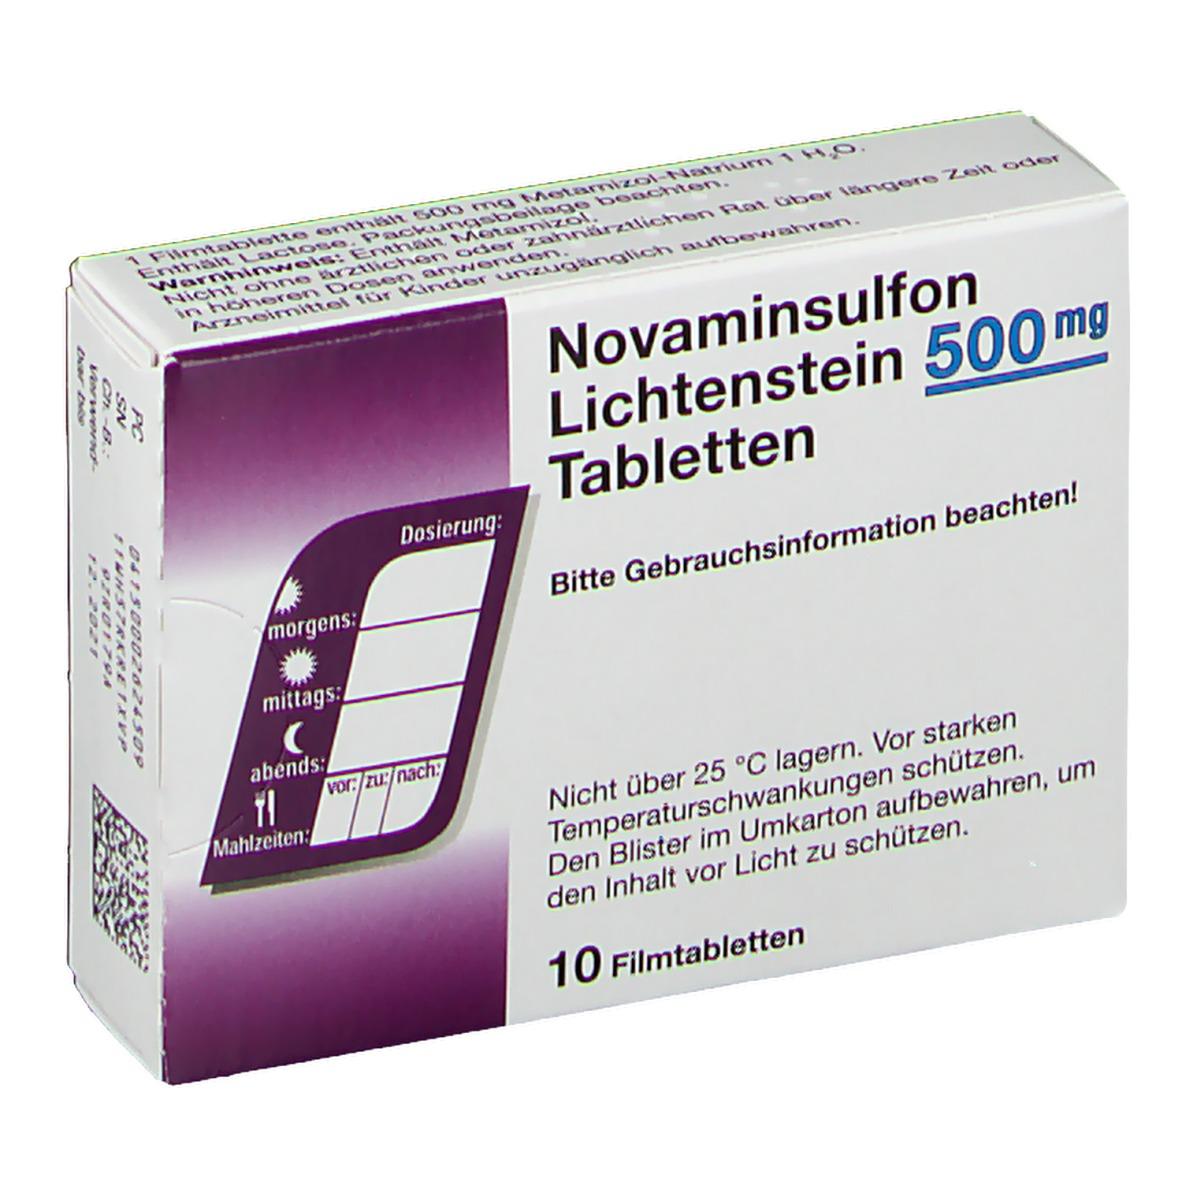 Novaminsulfon 500 mg Lichtenstein Filmtabletten 10 St